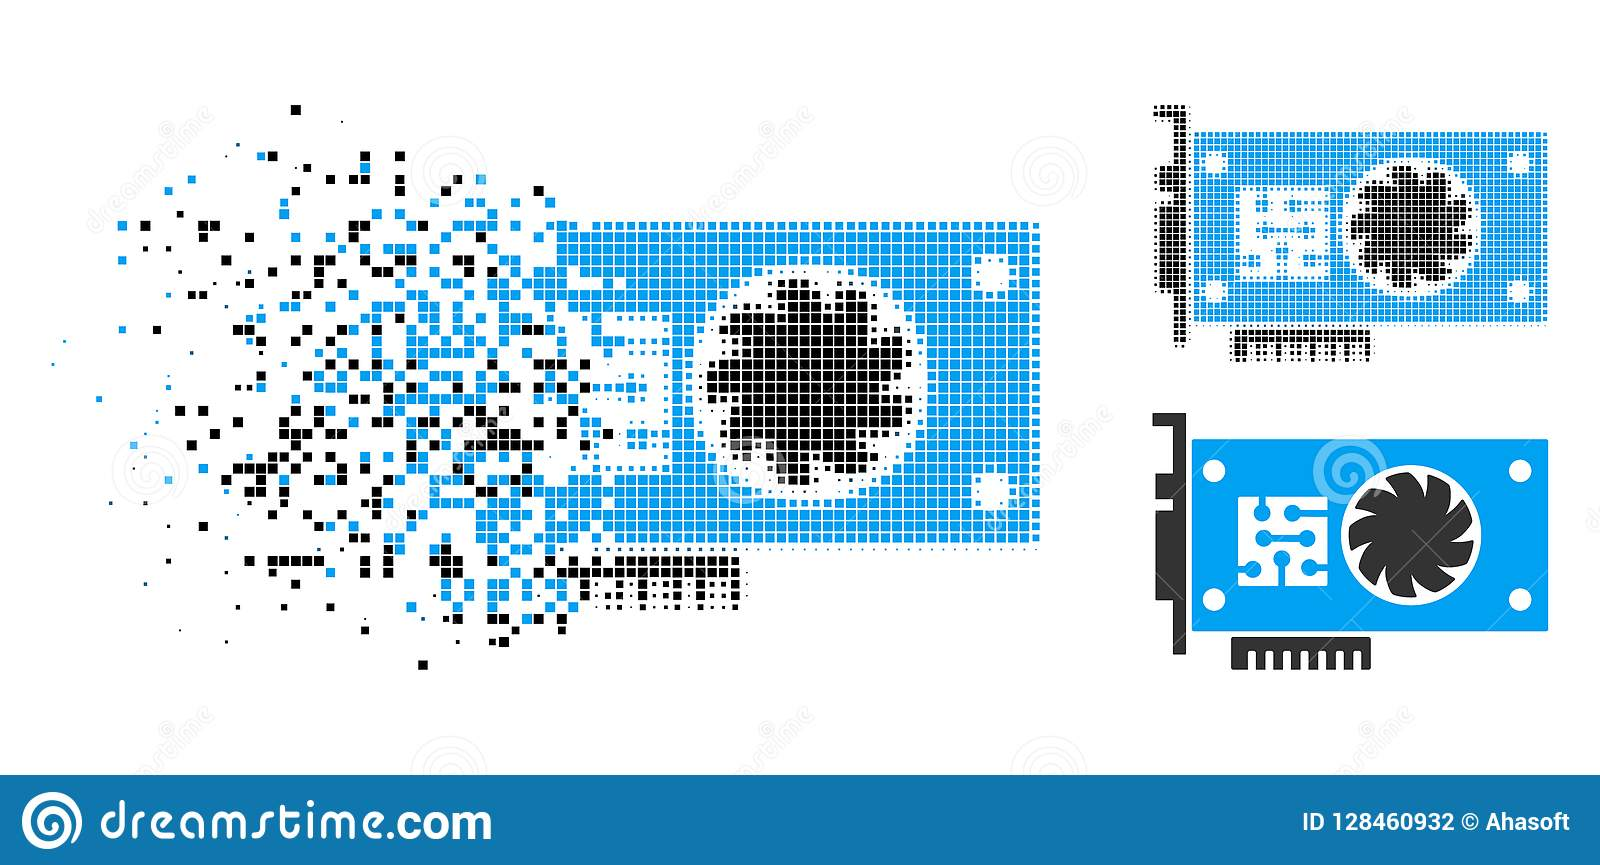 Strimlad symbol för Pixelated rastrerad GPU gaspedalkort